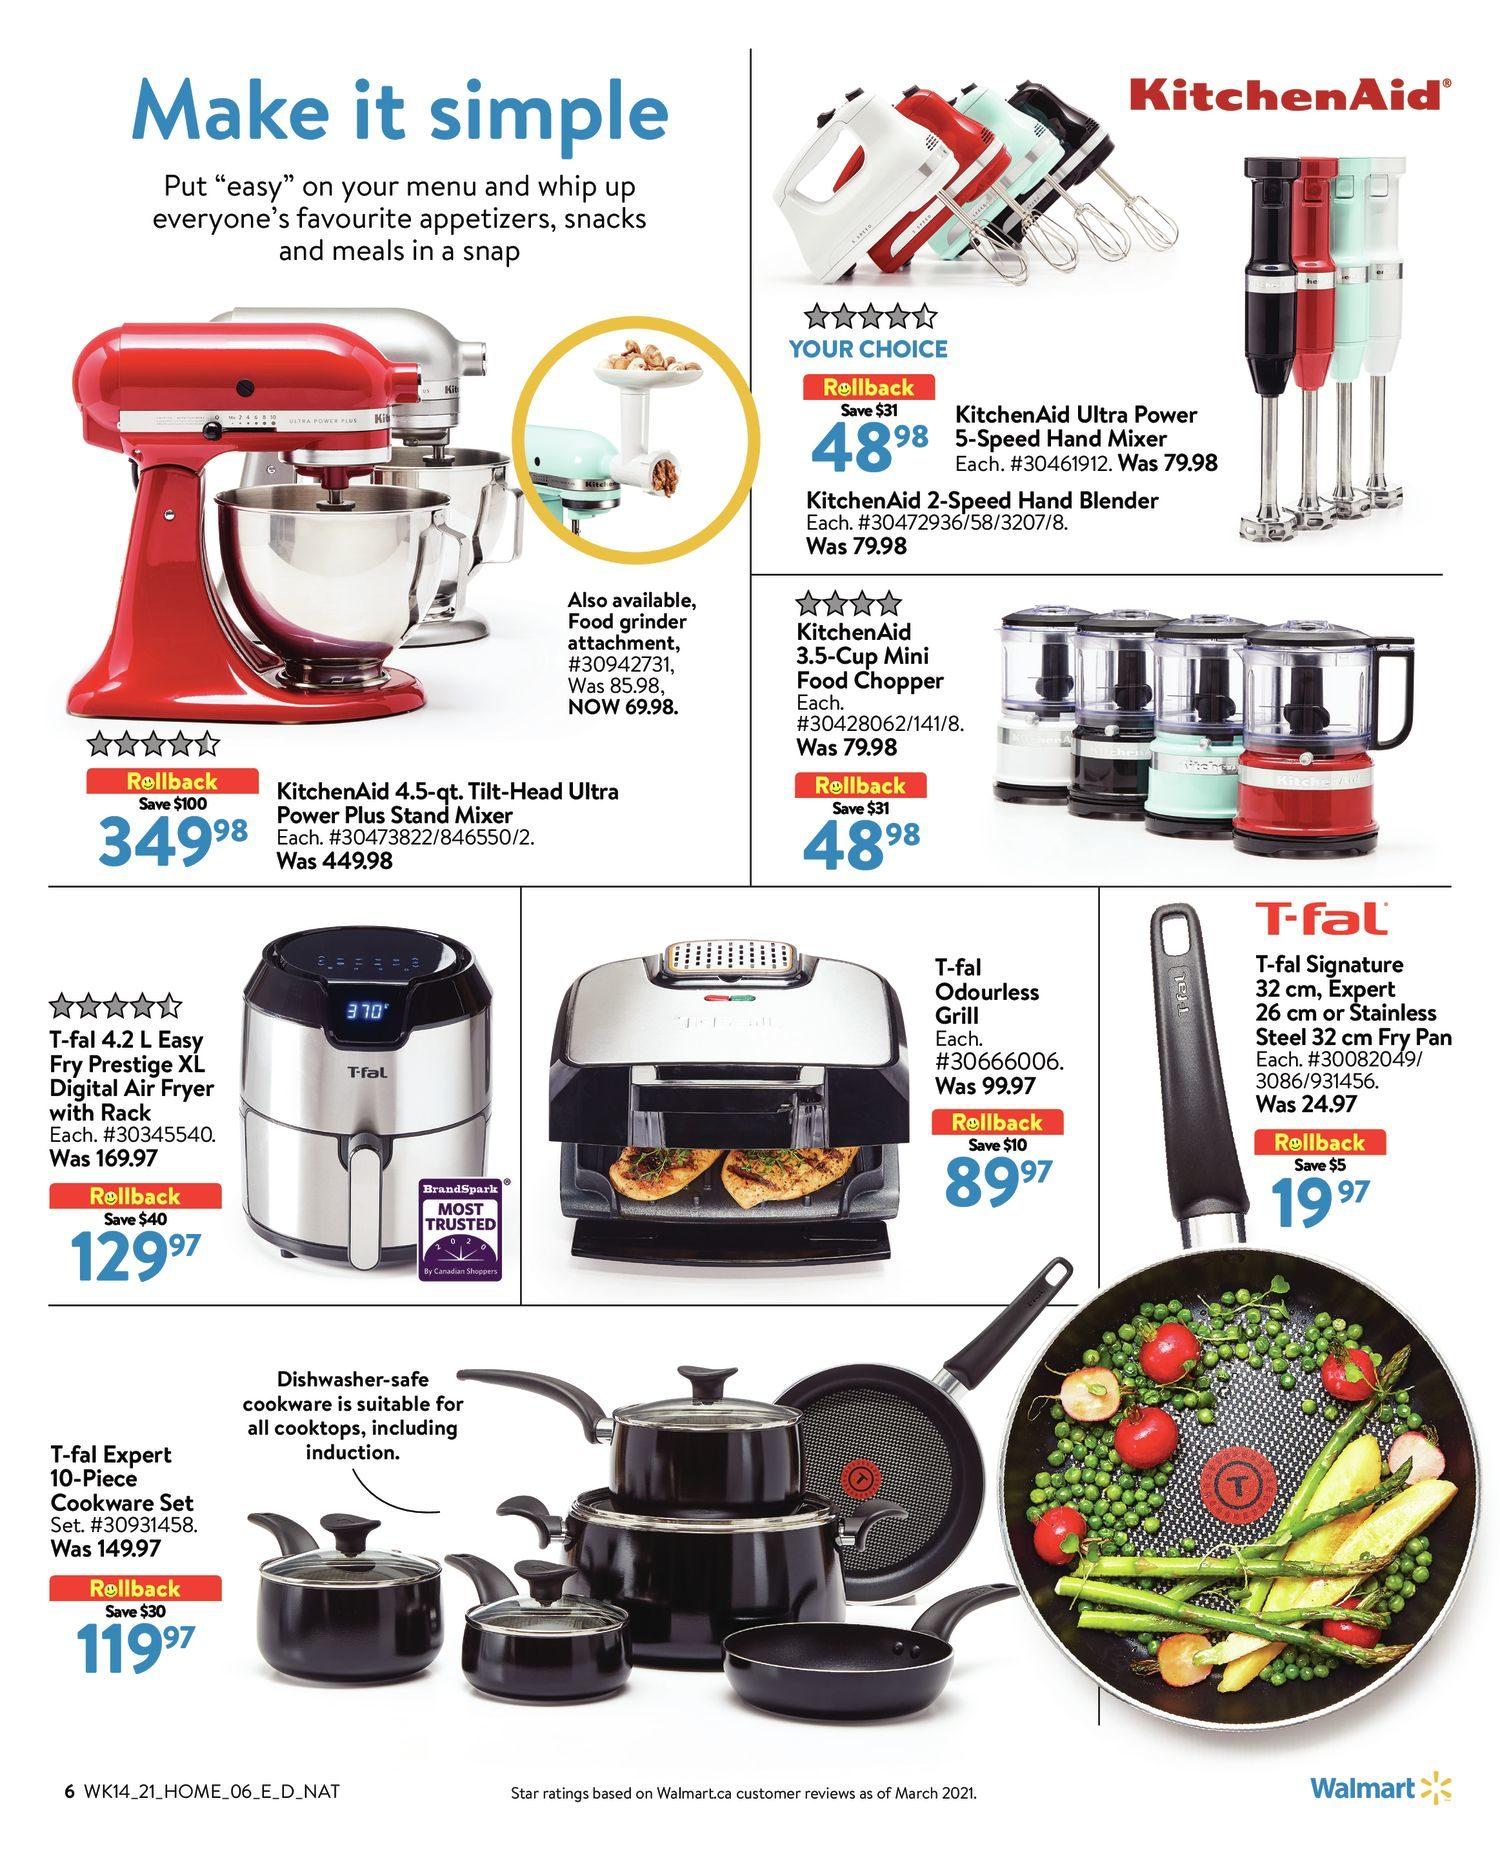 Walmart - Home Book - Page 6